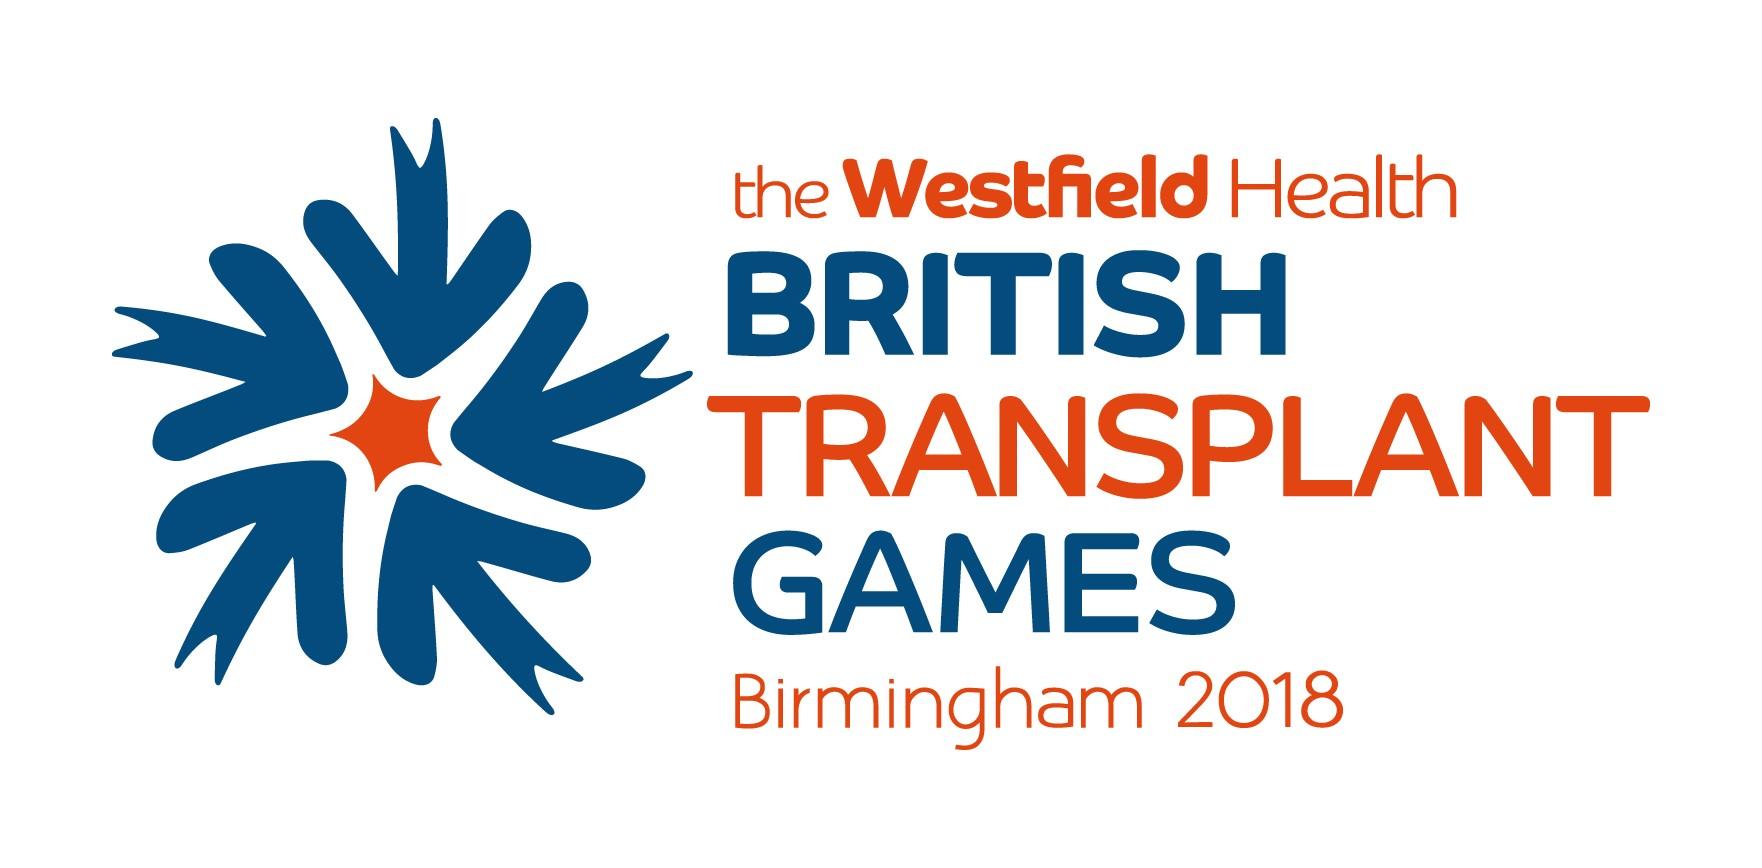 The Westfield Health British Transplant Games 2018 logo